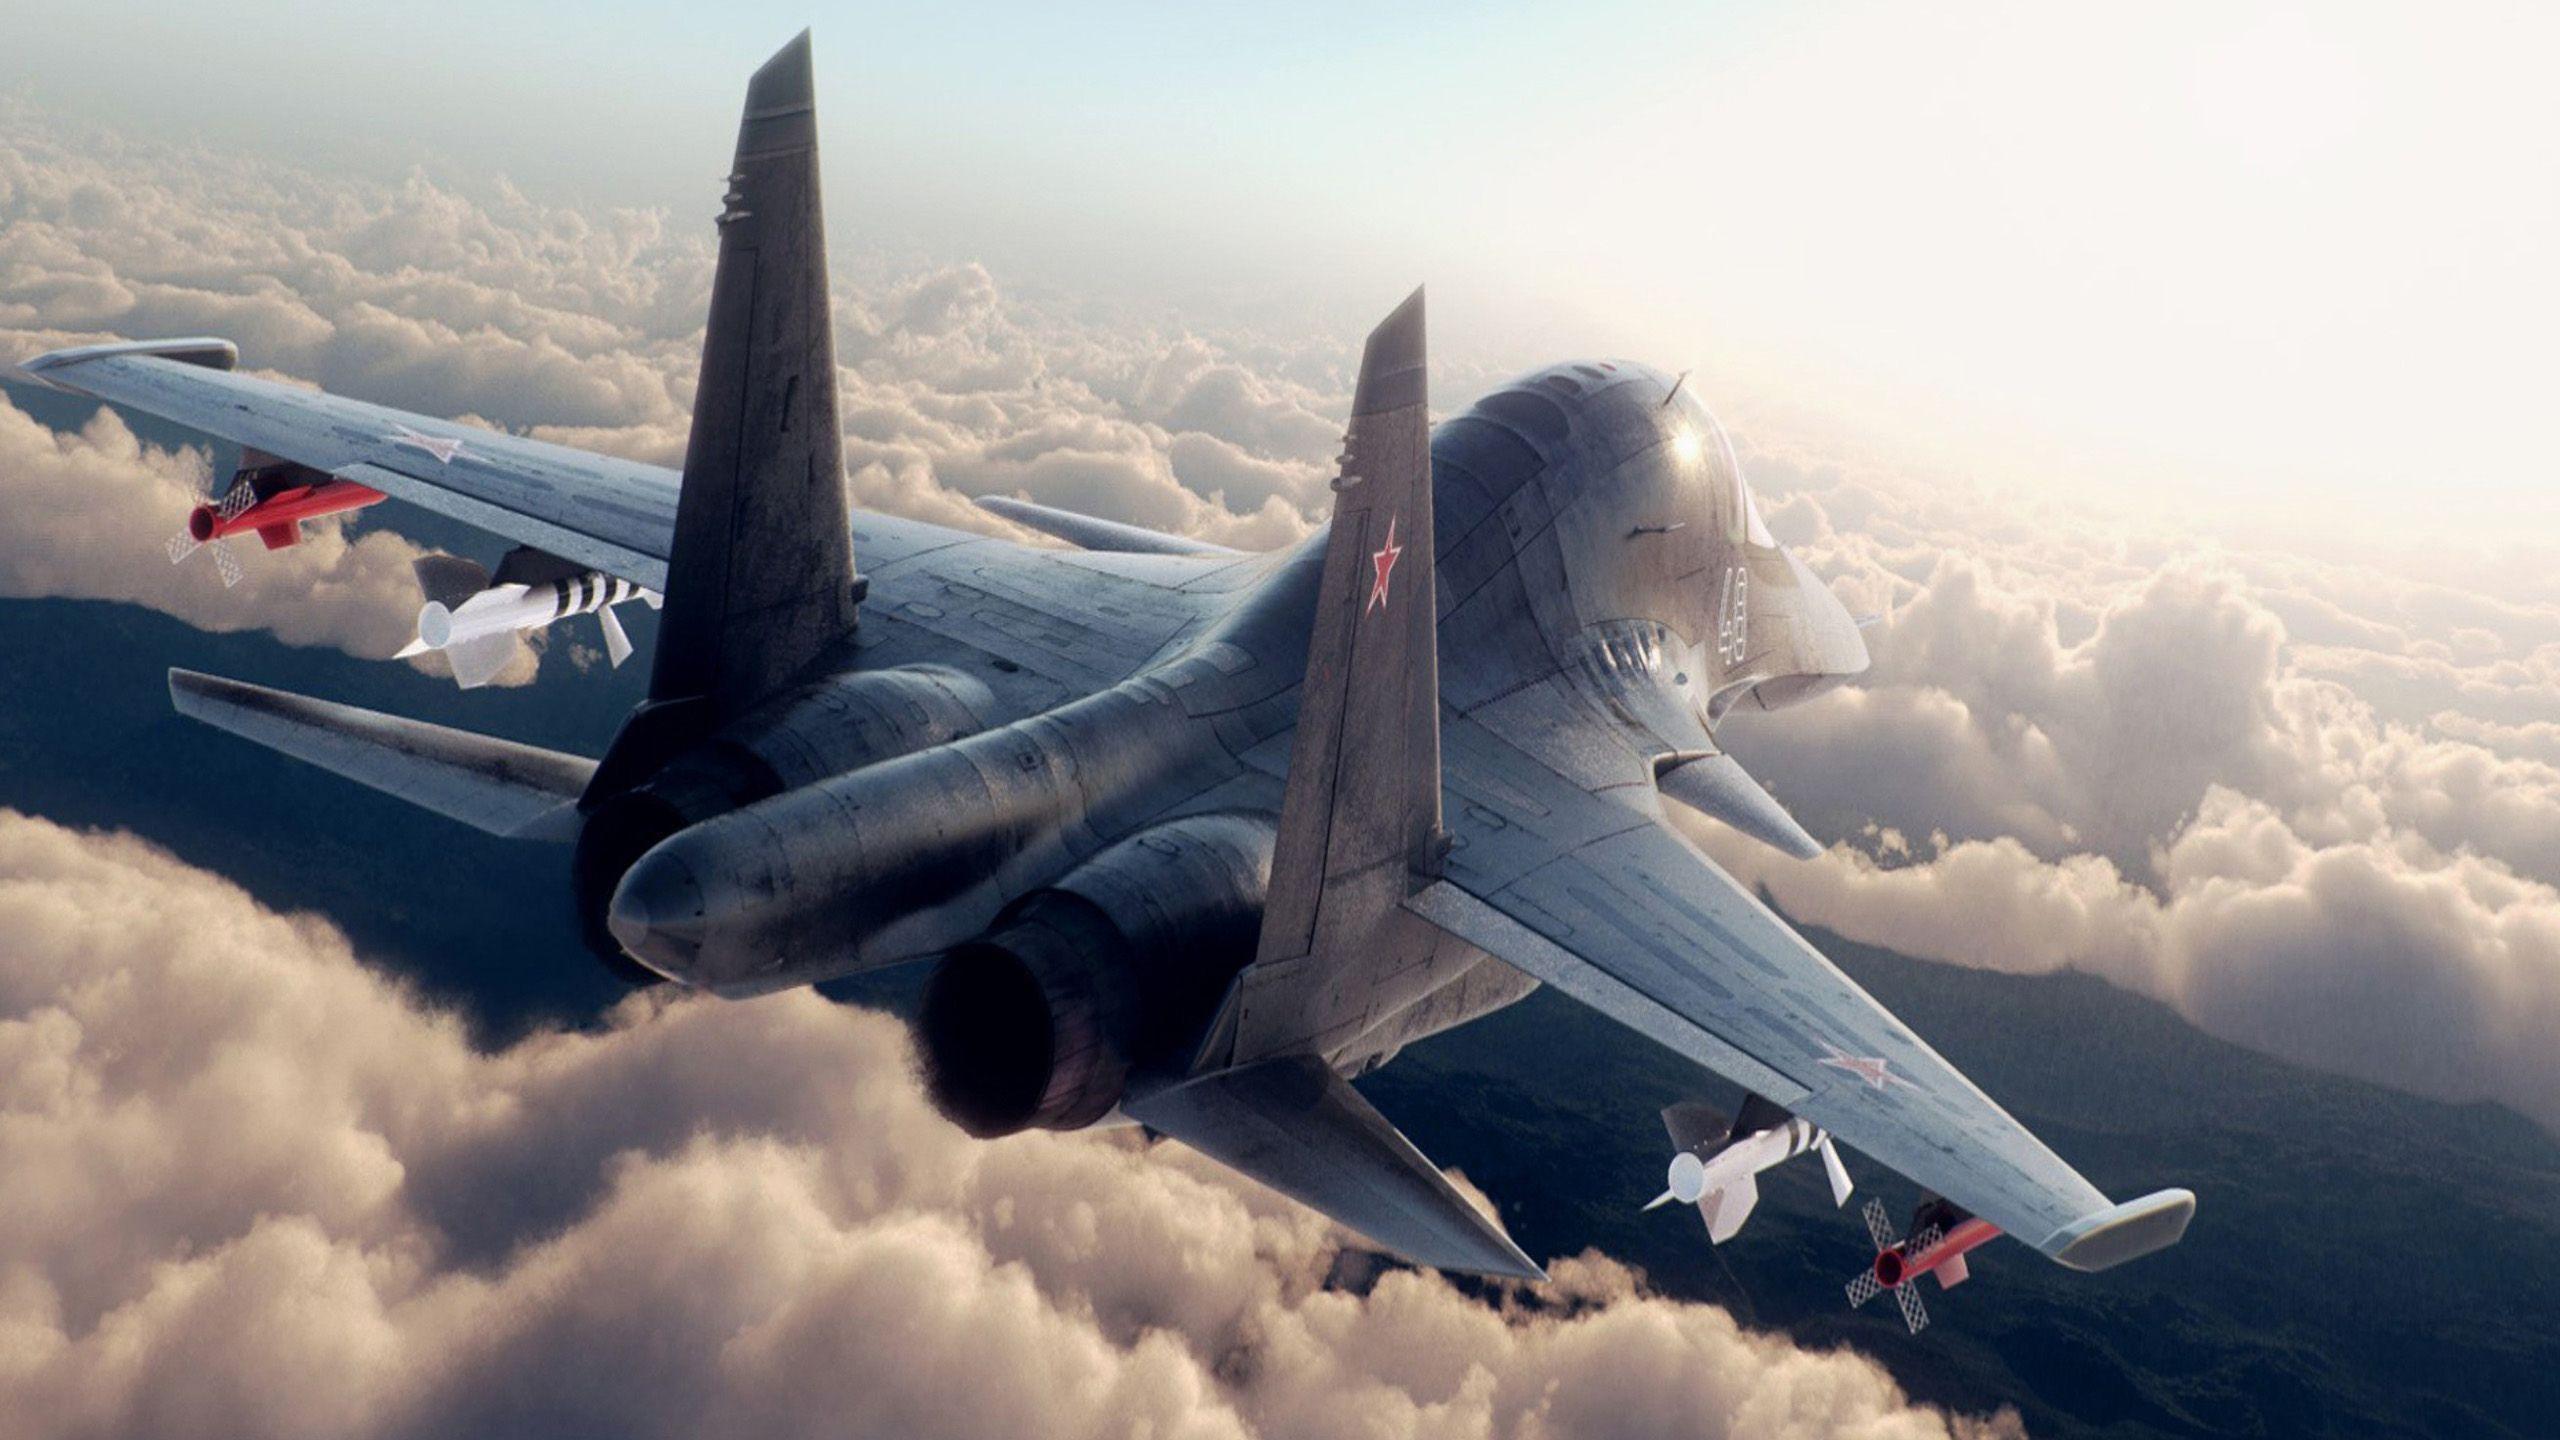 military aircraft wallpapers wallpaper cave | aircraft wallpaper